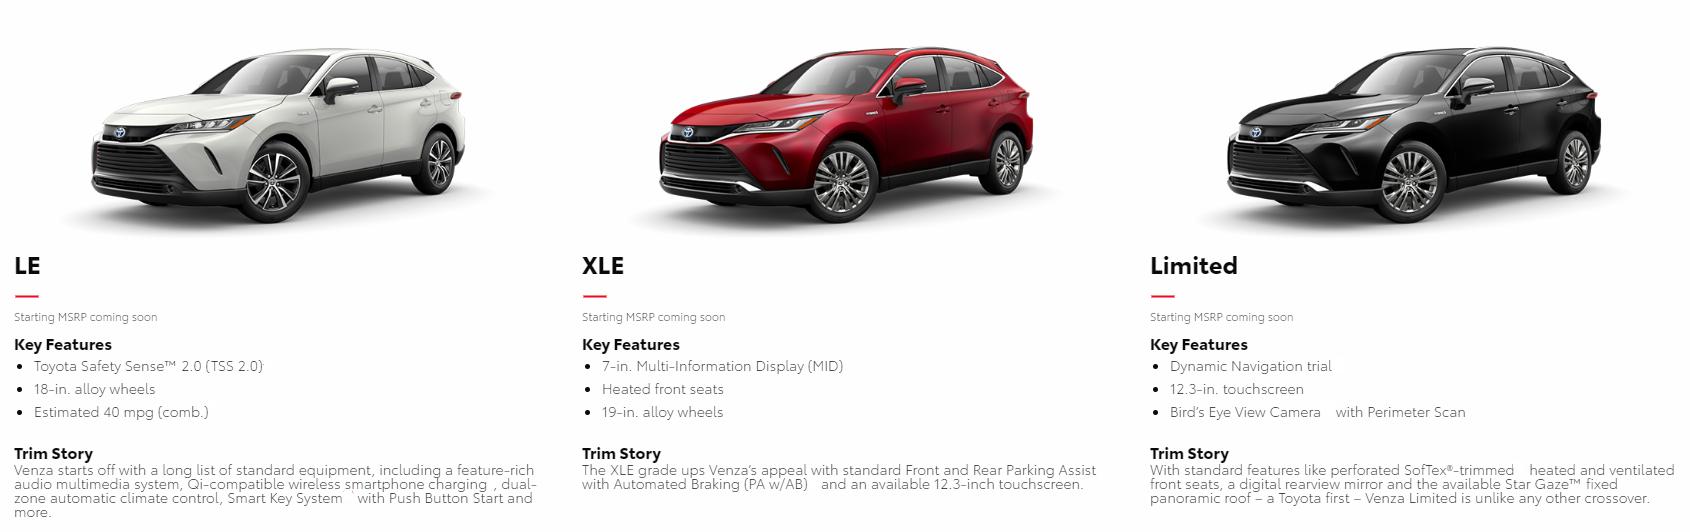 2021 Toyota Venza Trim Levels